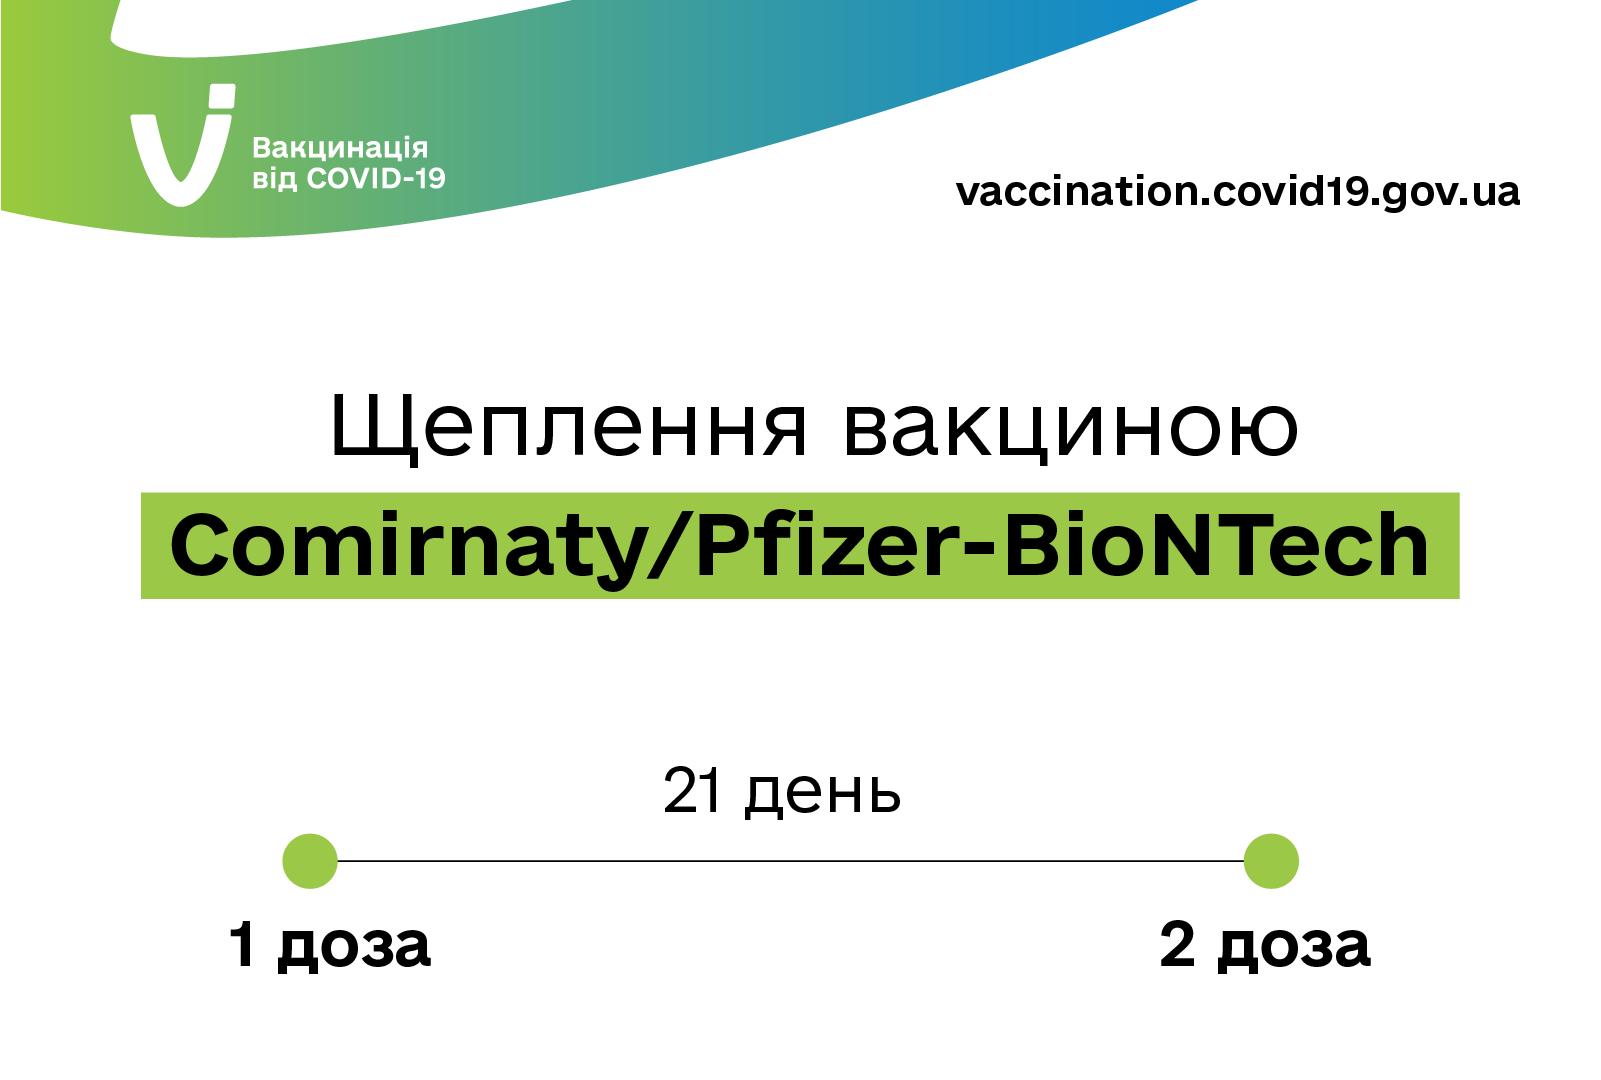 Вакцинація Comirnaty/Pfizer-BioNTech.